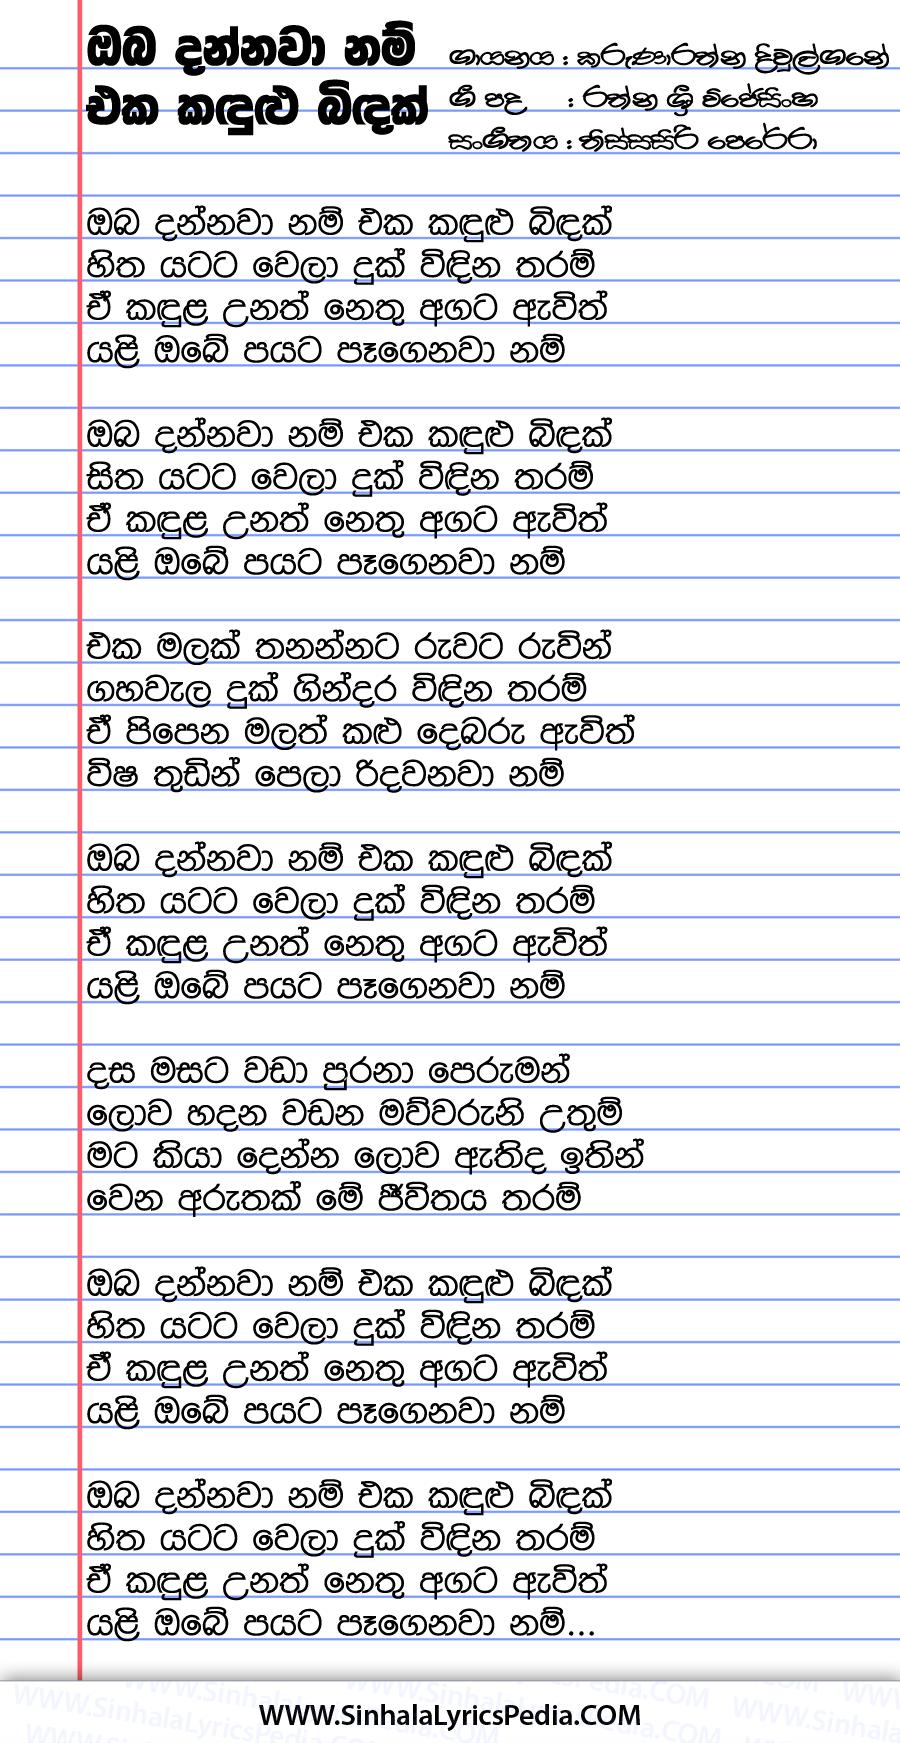 Oba Dannawanam Eka Kandulu Bindak Song Lyrics